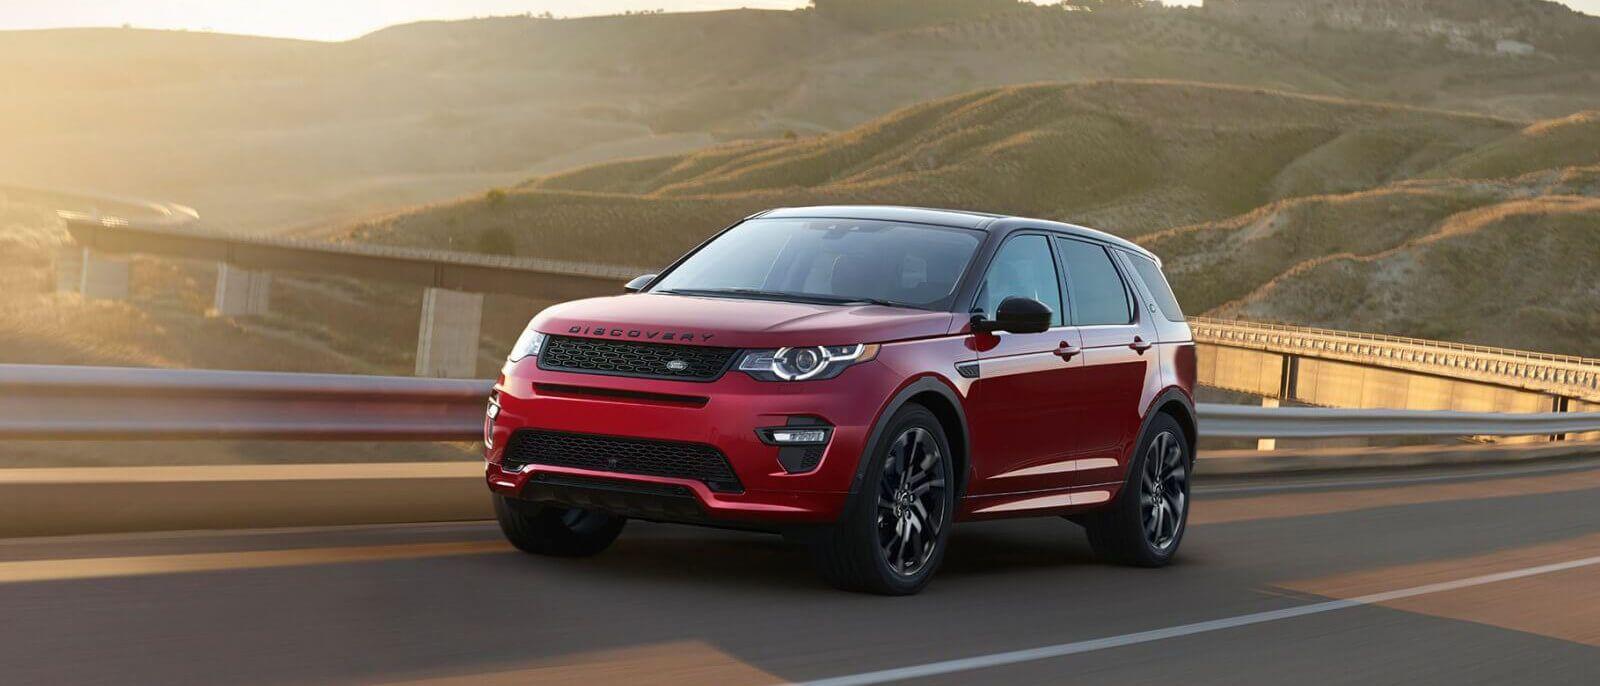 2017 Land Rover Discovery Sport Land Rover Colorado